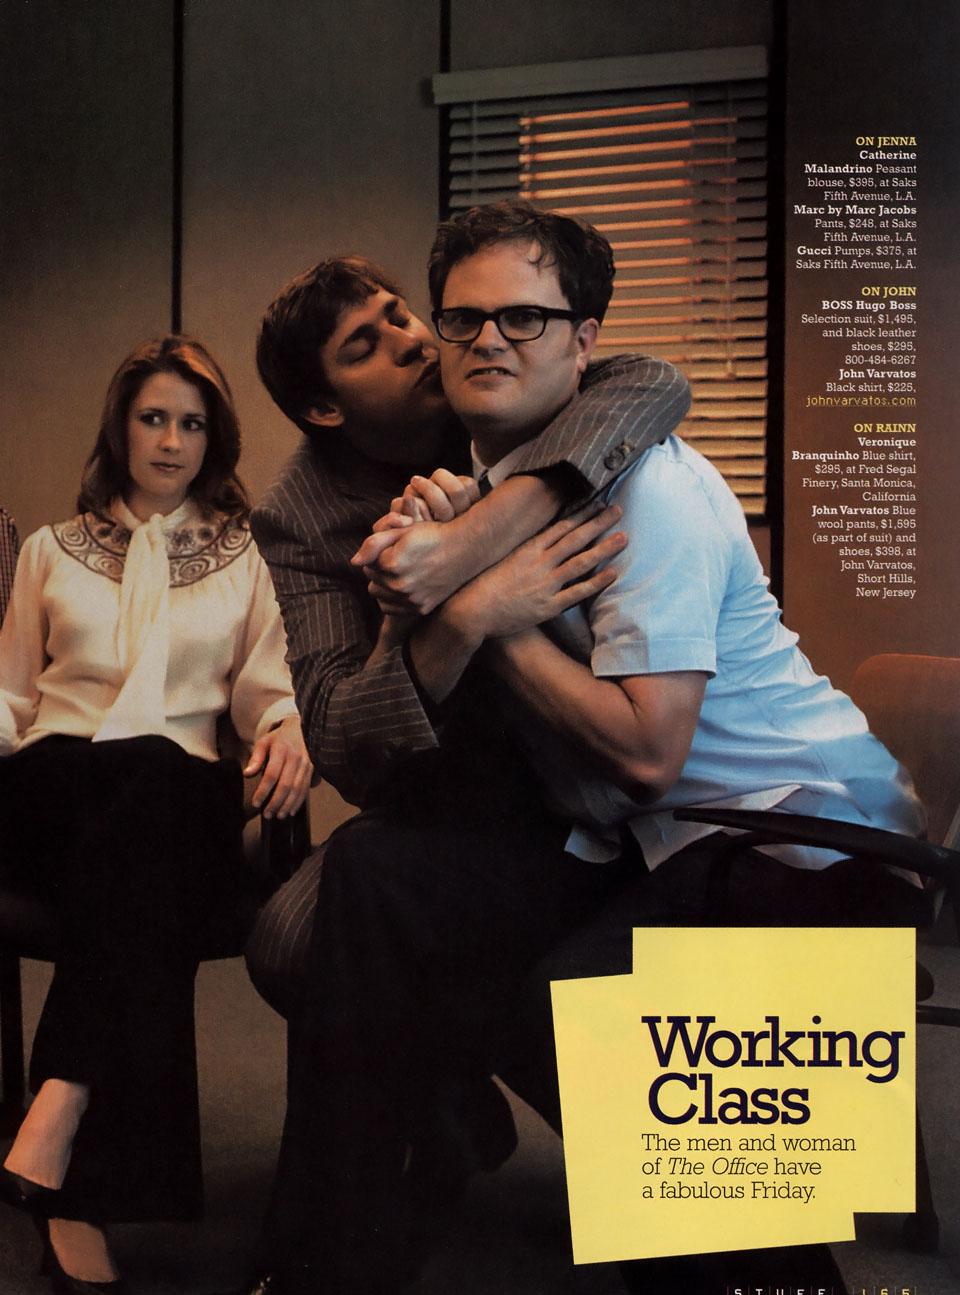 Pam, Jim and Dwight